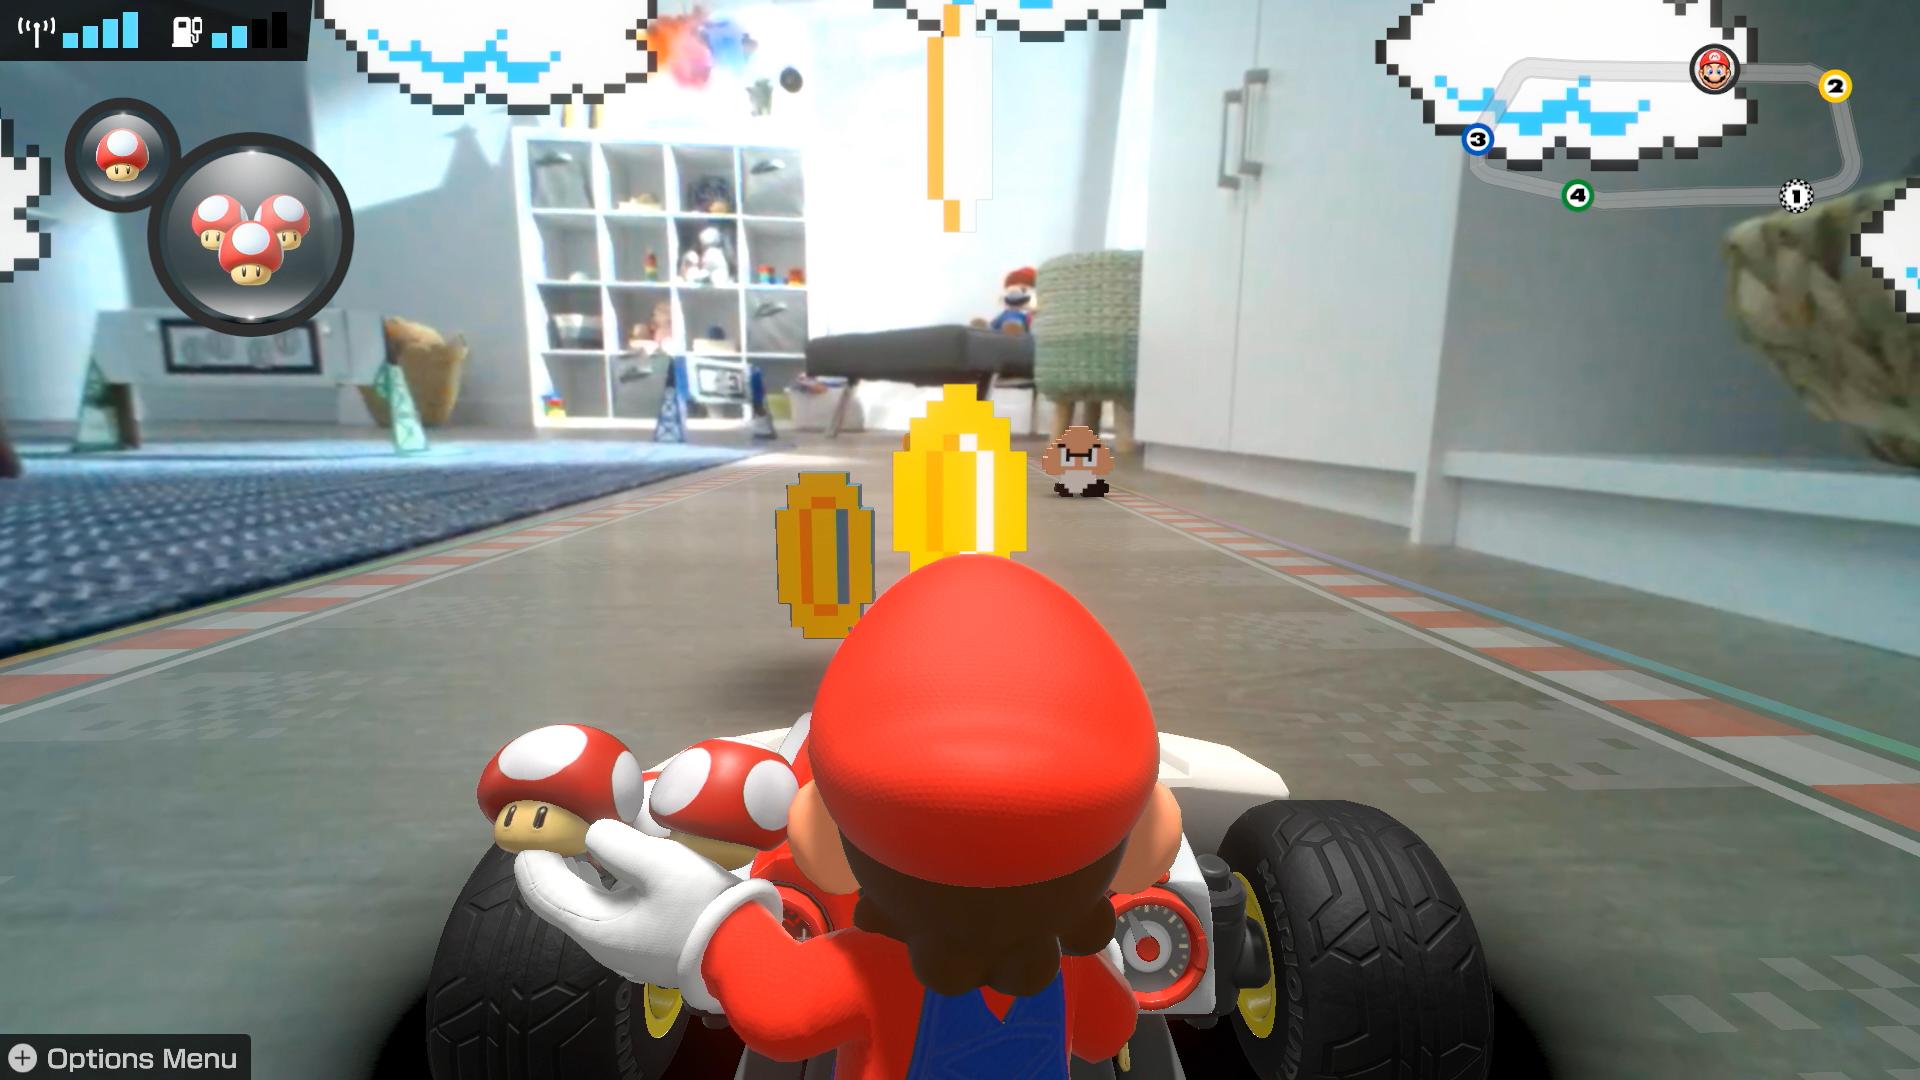 Mario Kart Live: Home Circuit 8-bit environment